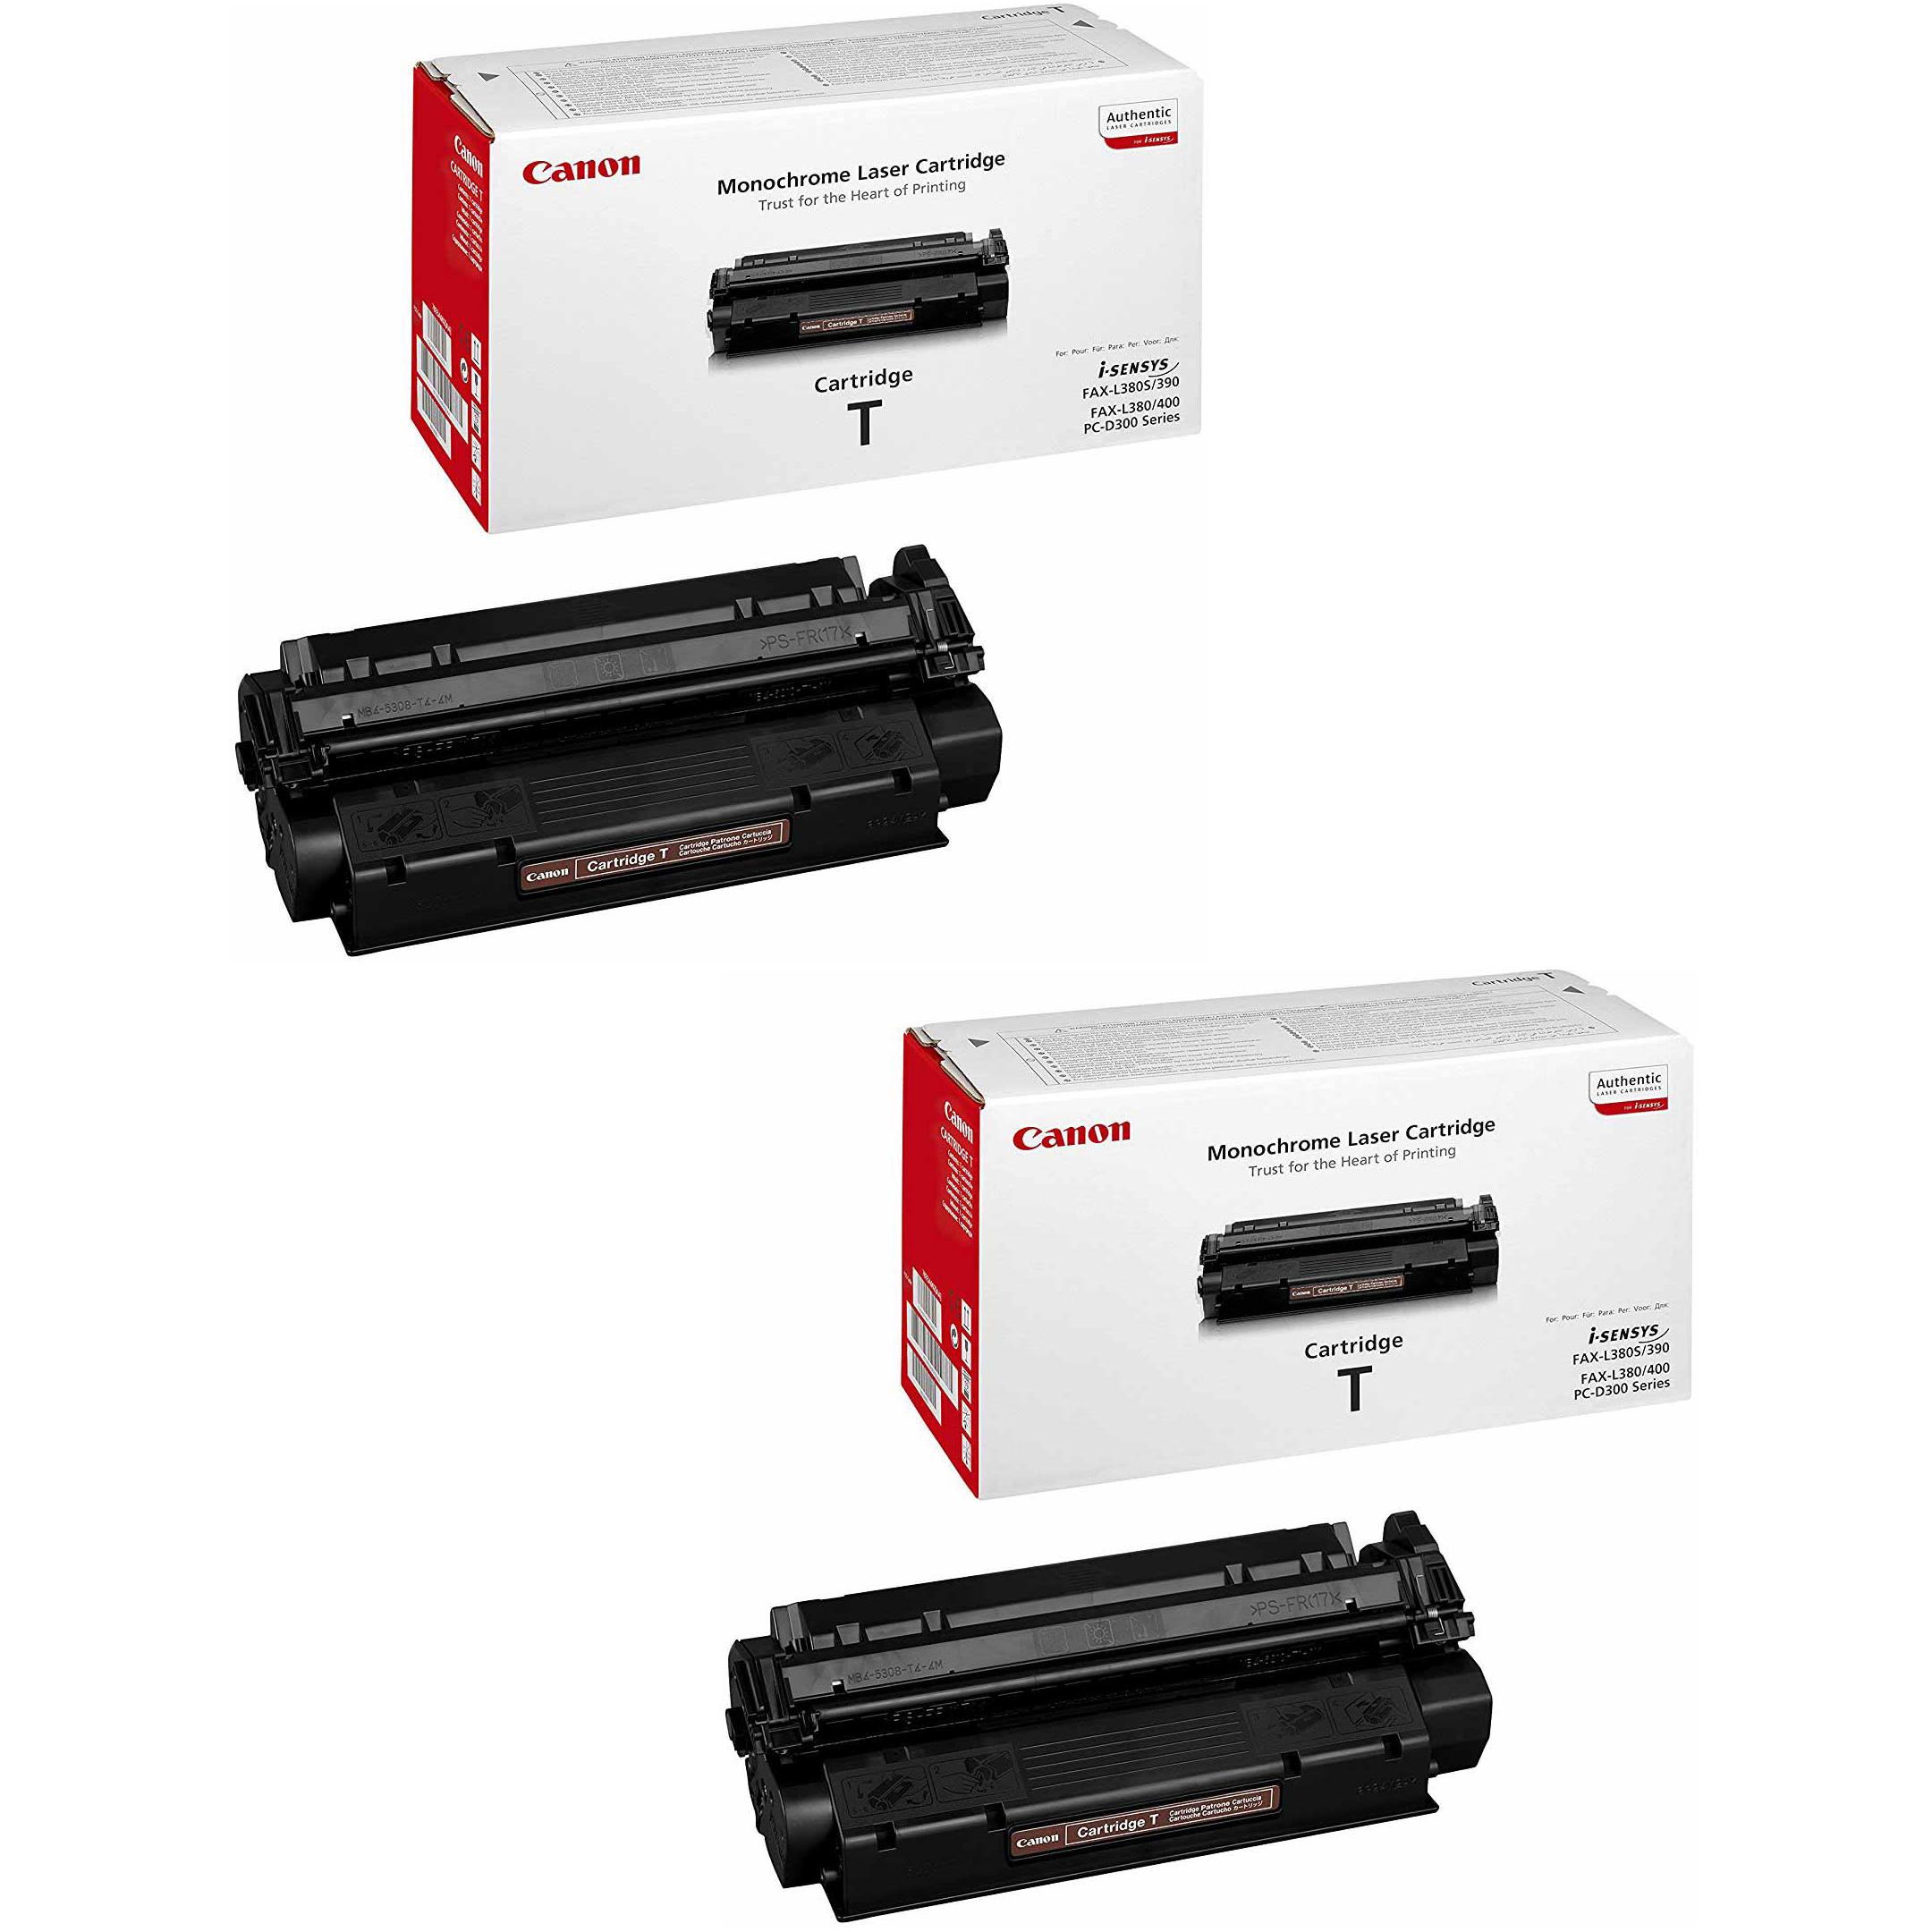 Original Canon T-Cartridges Black Twin Pack Toner Cartridges (7833A002AA)